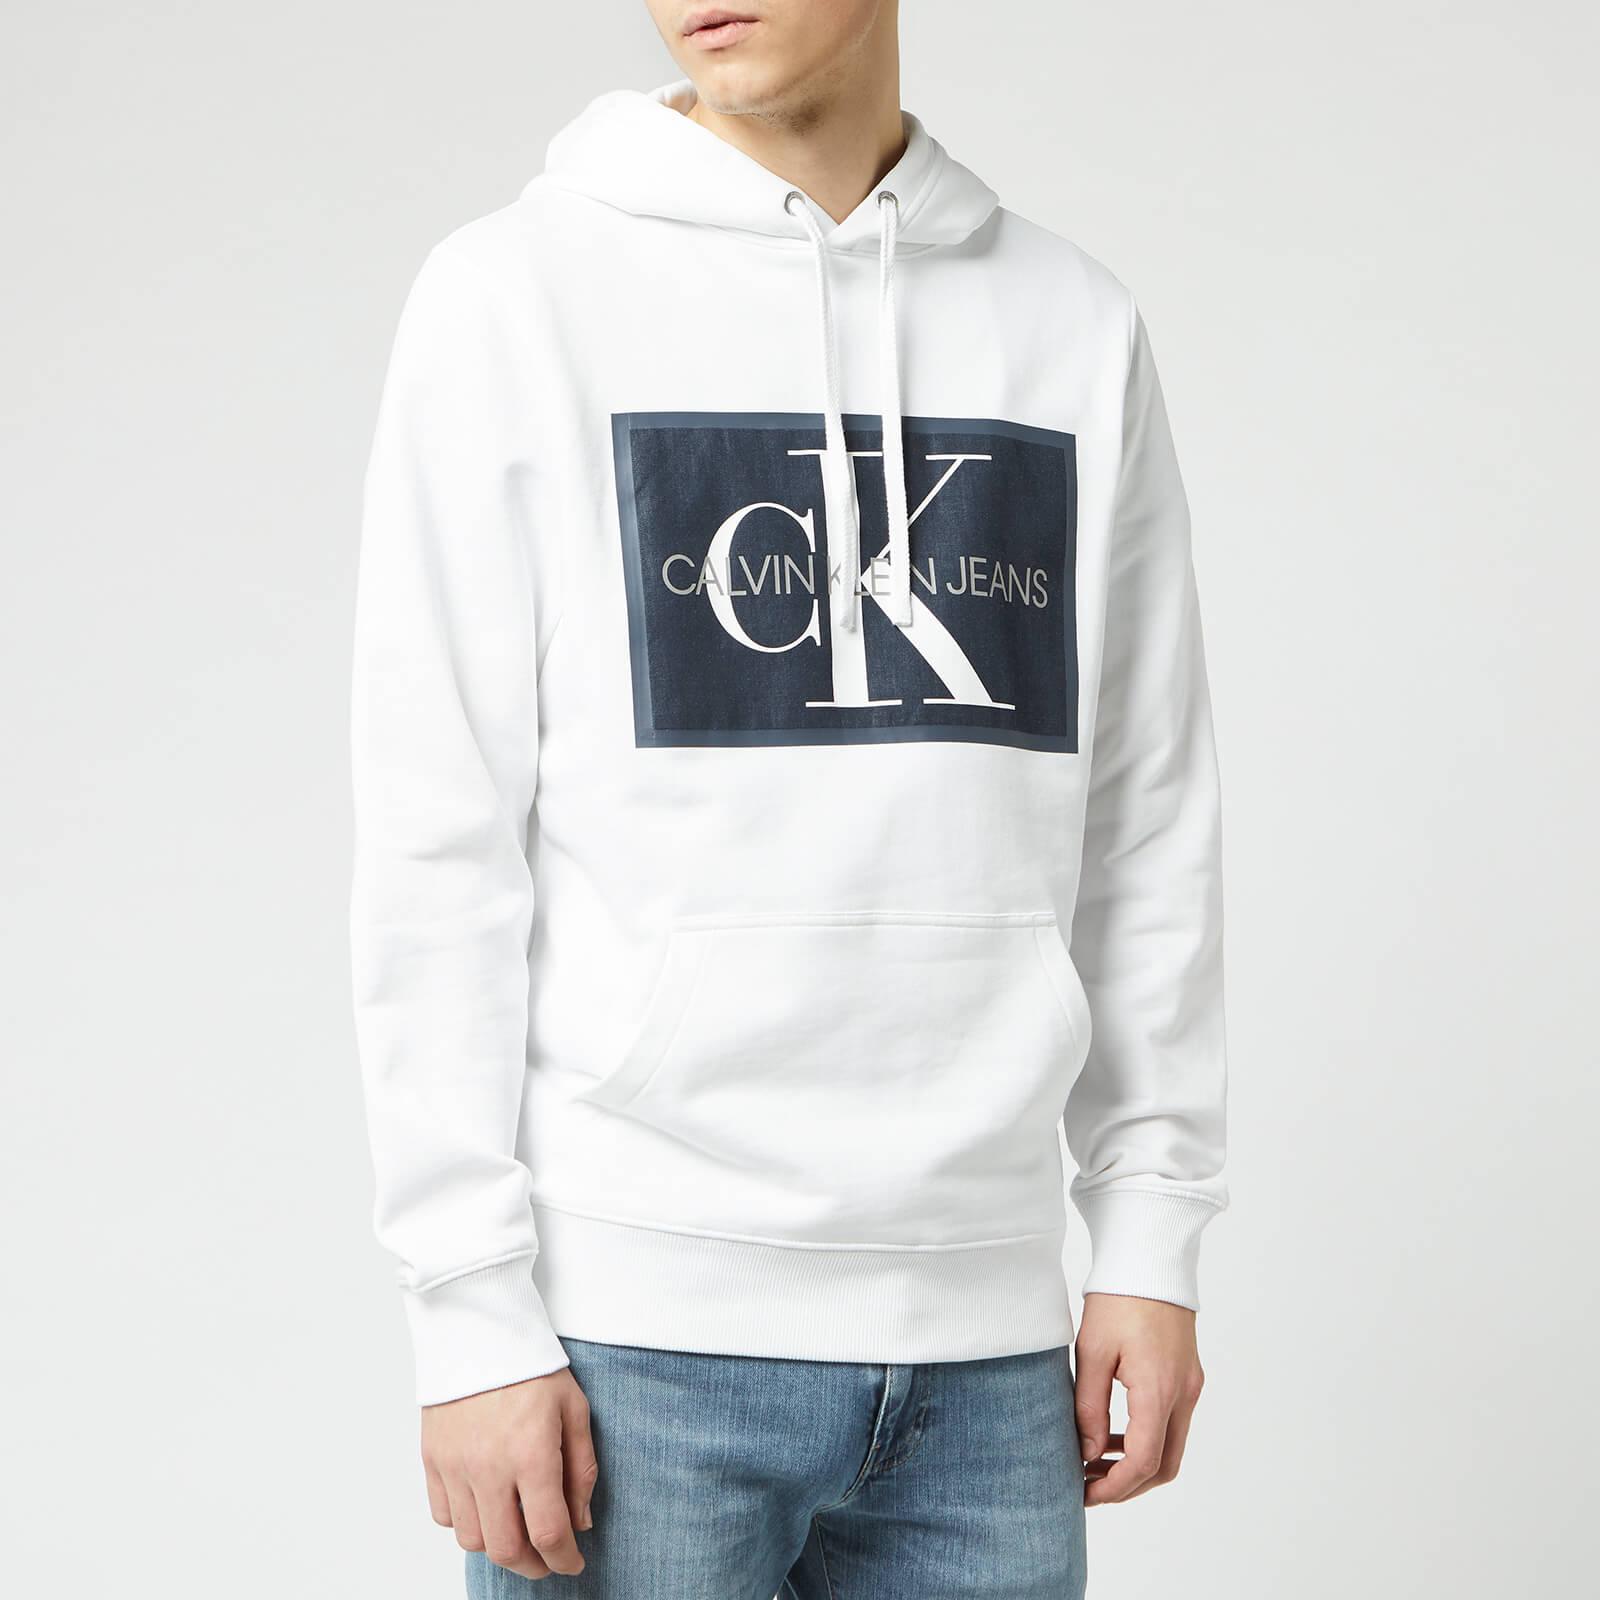 Calvin Klein Jeans Men's Monogram Patch Hoodie - Bright White - L - White